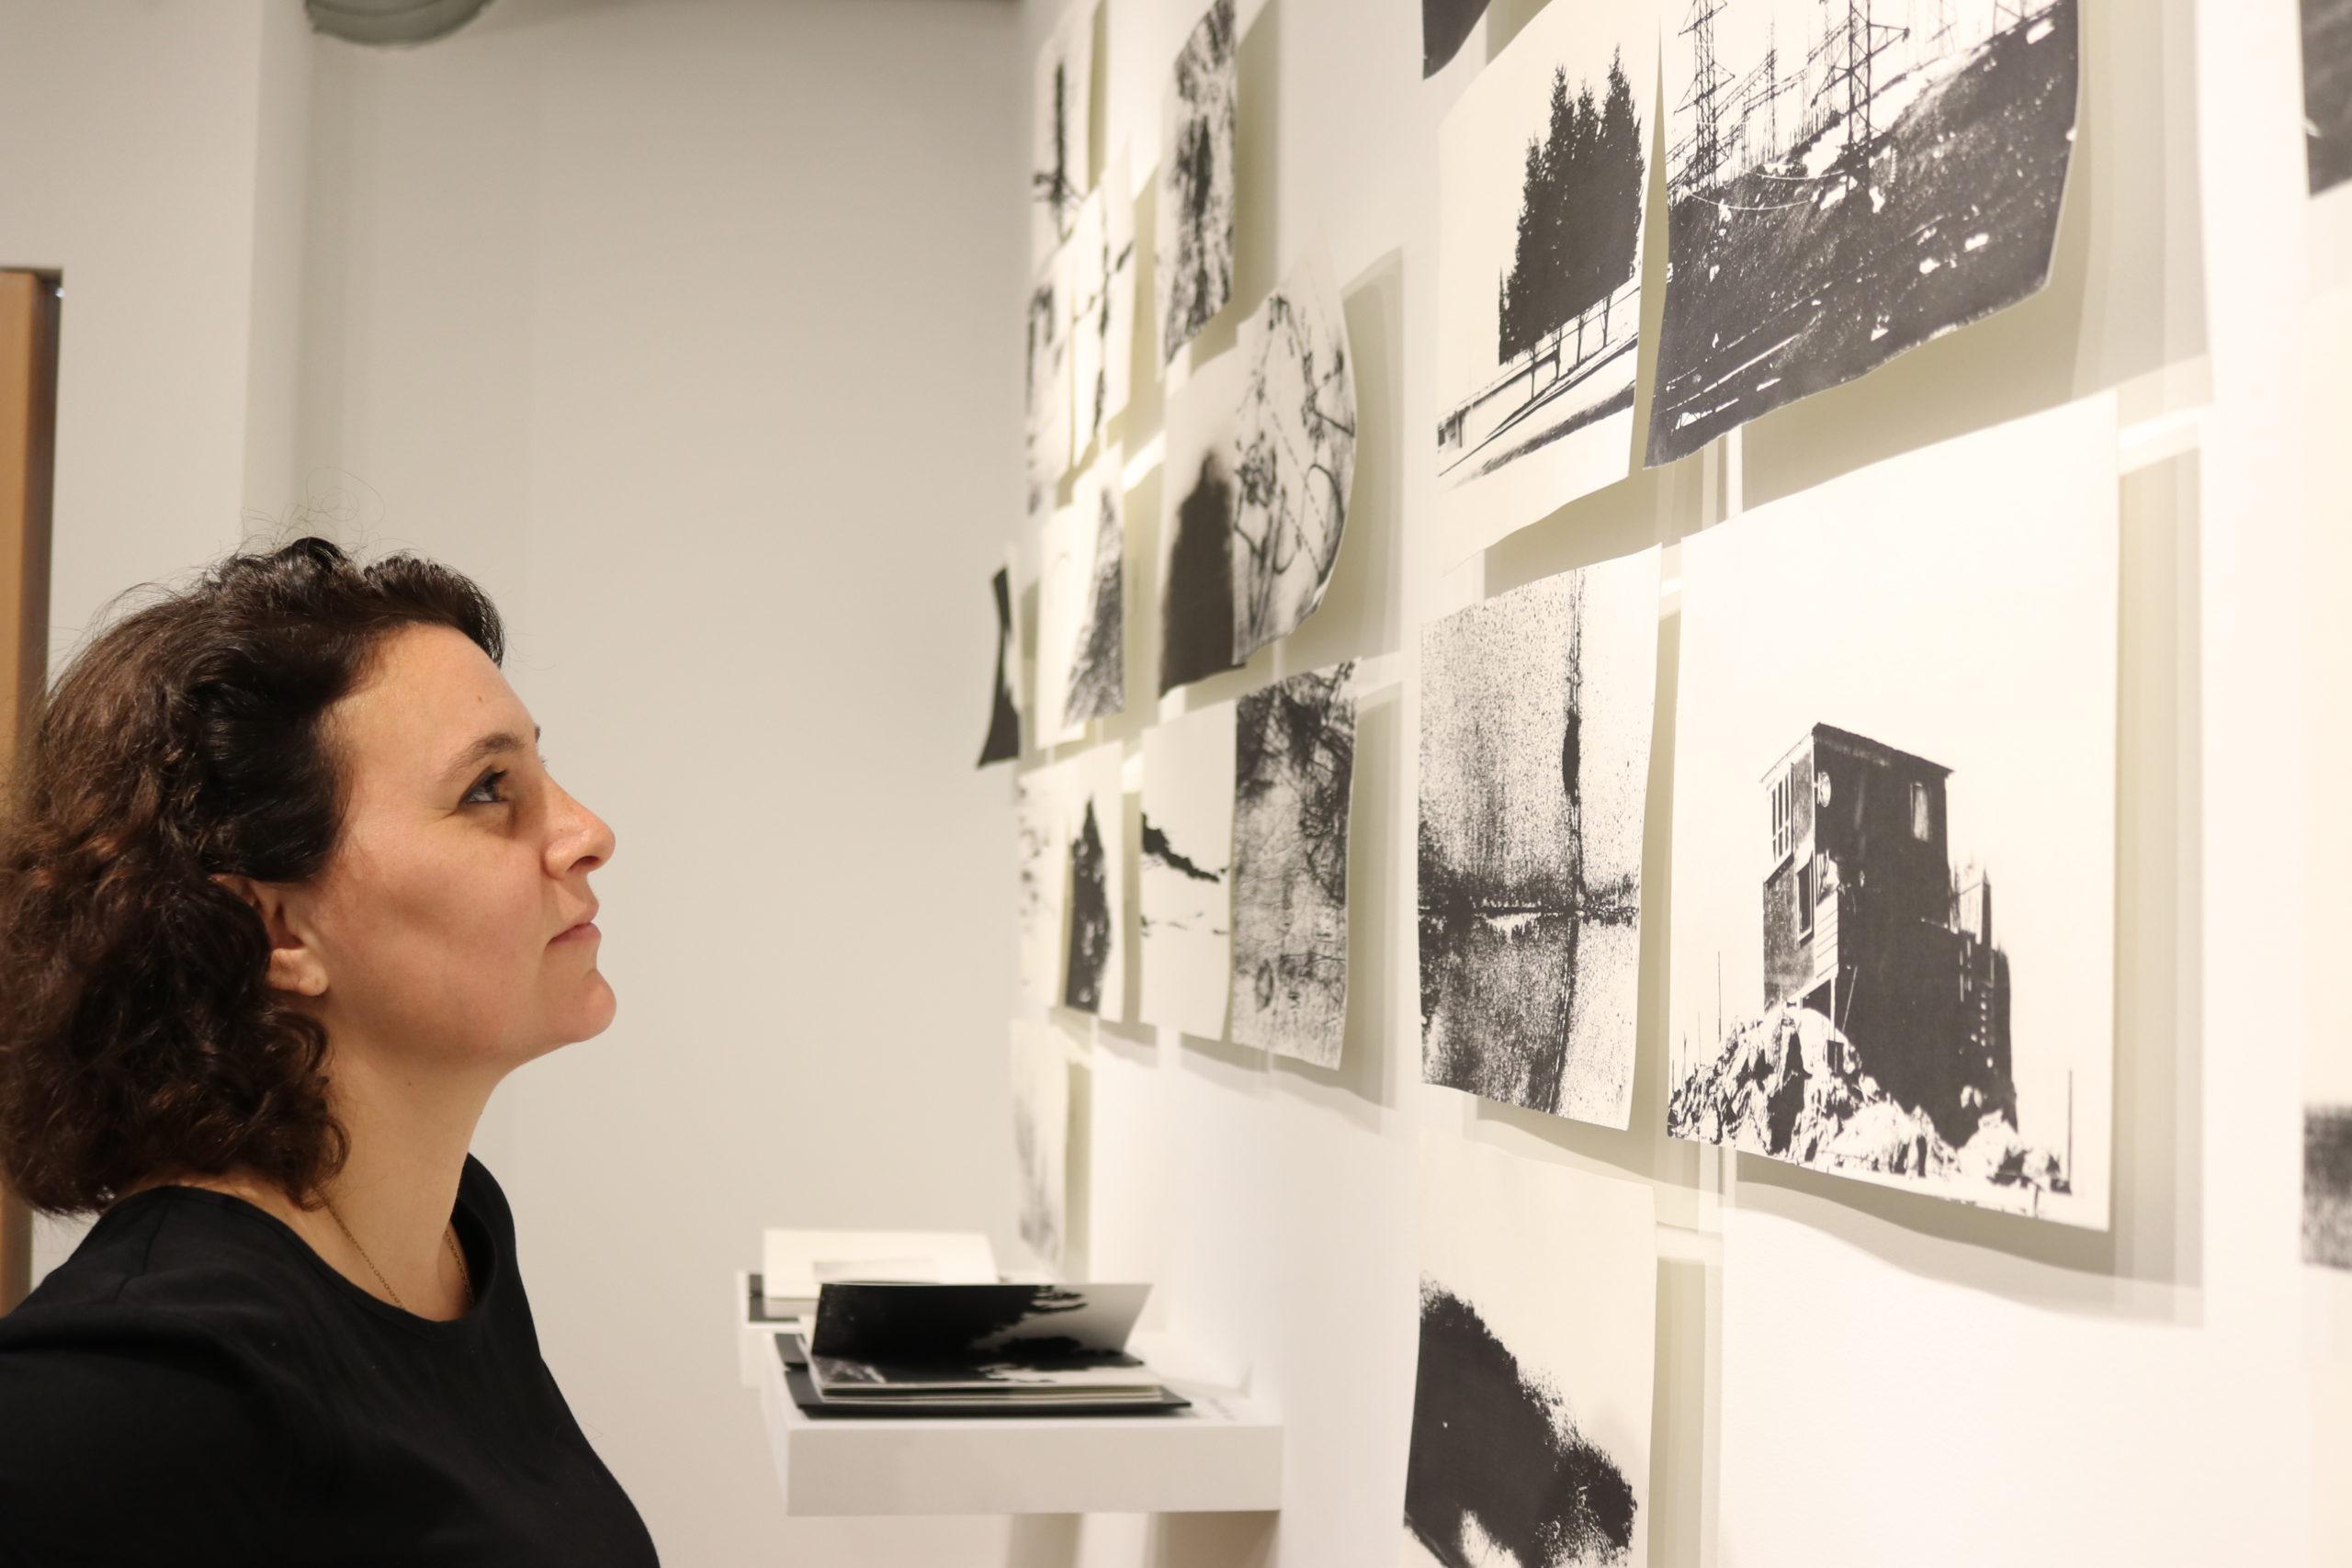 artist looks at her artwork